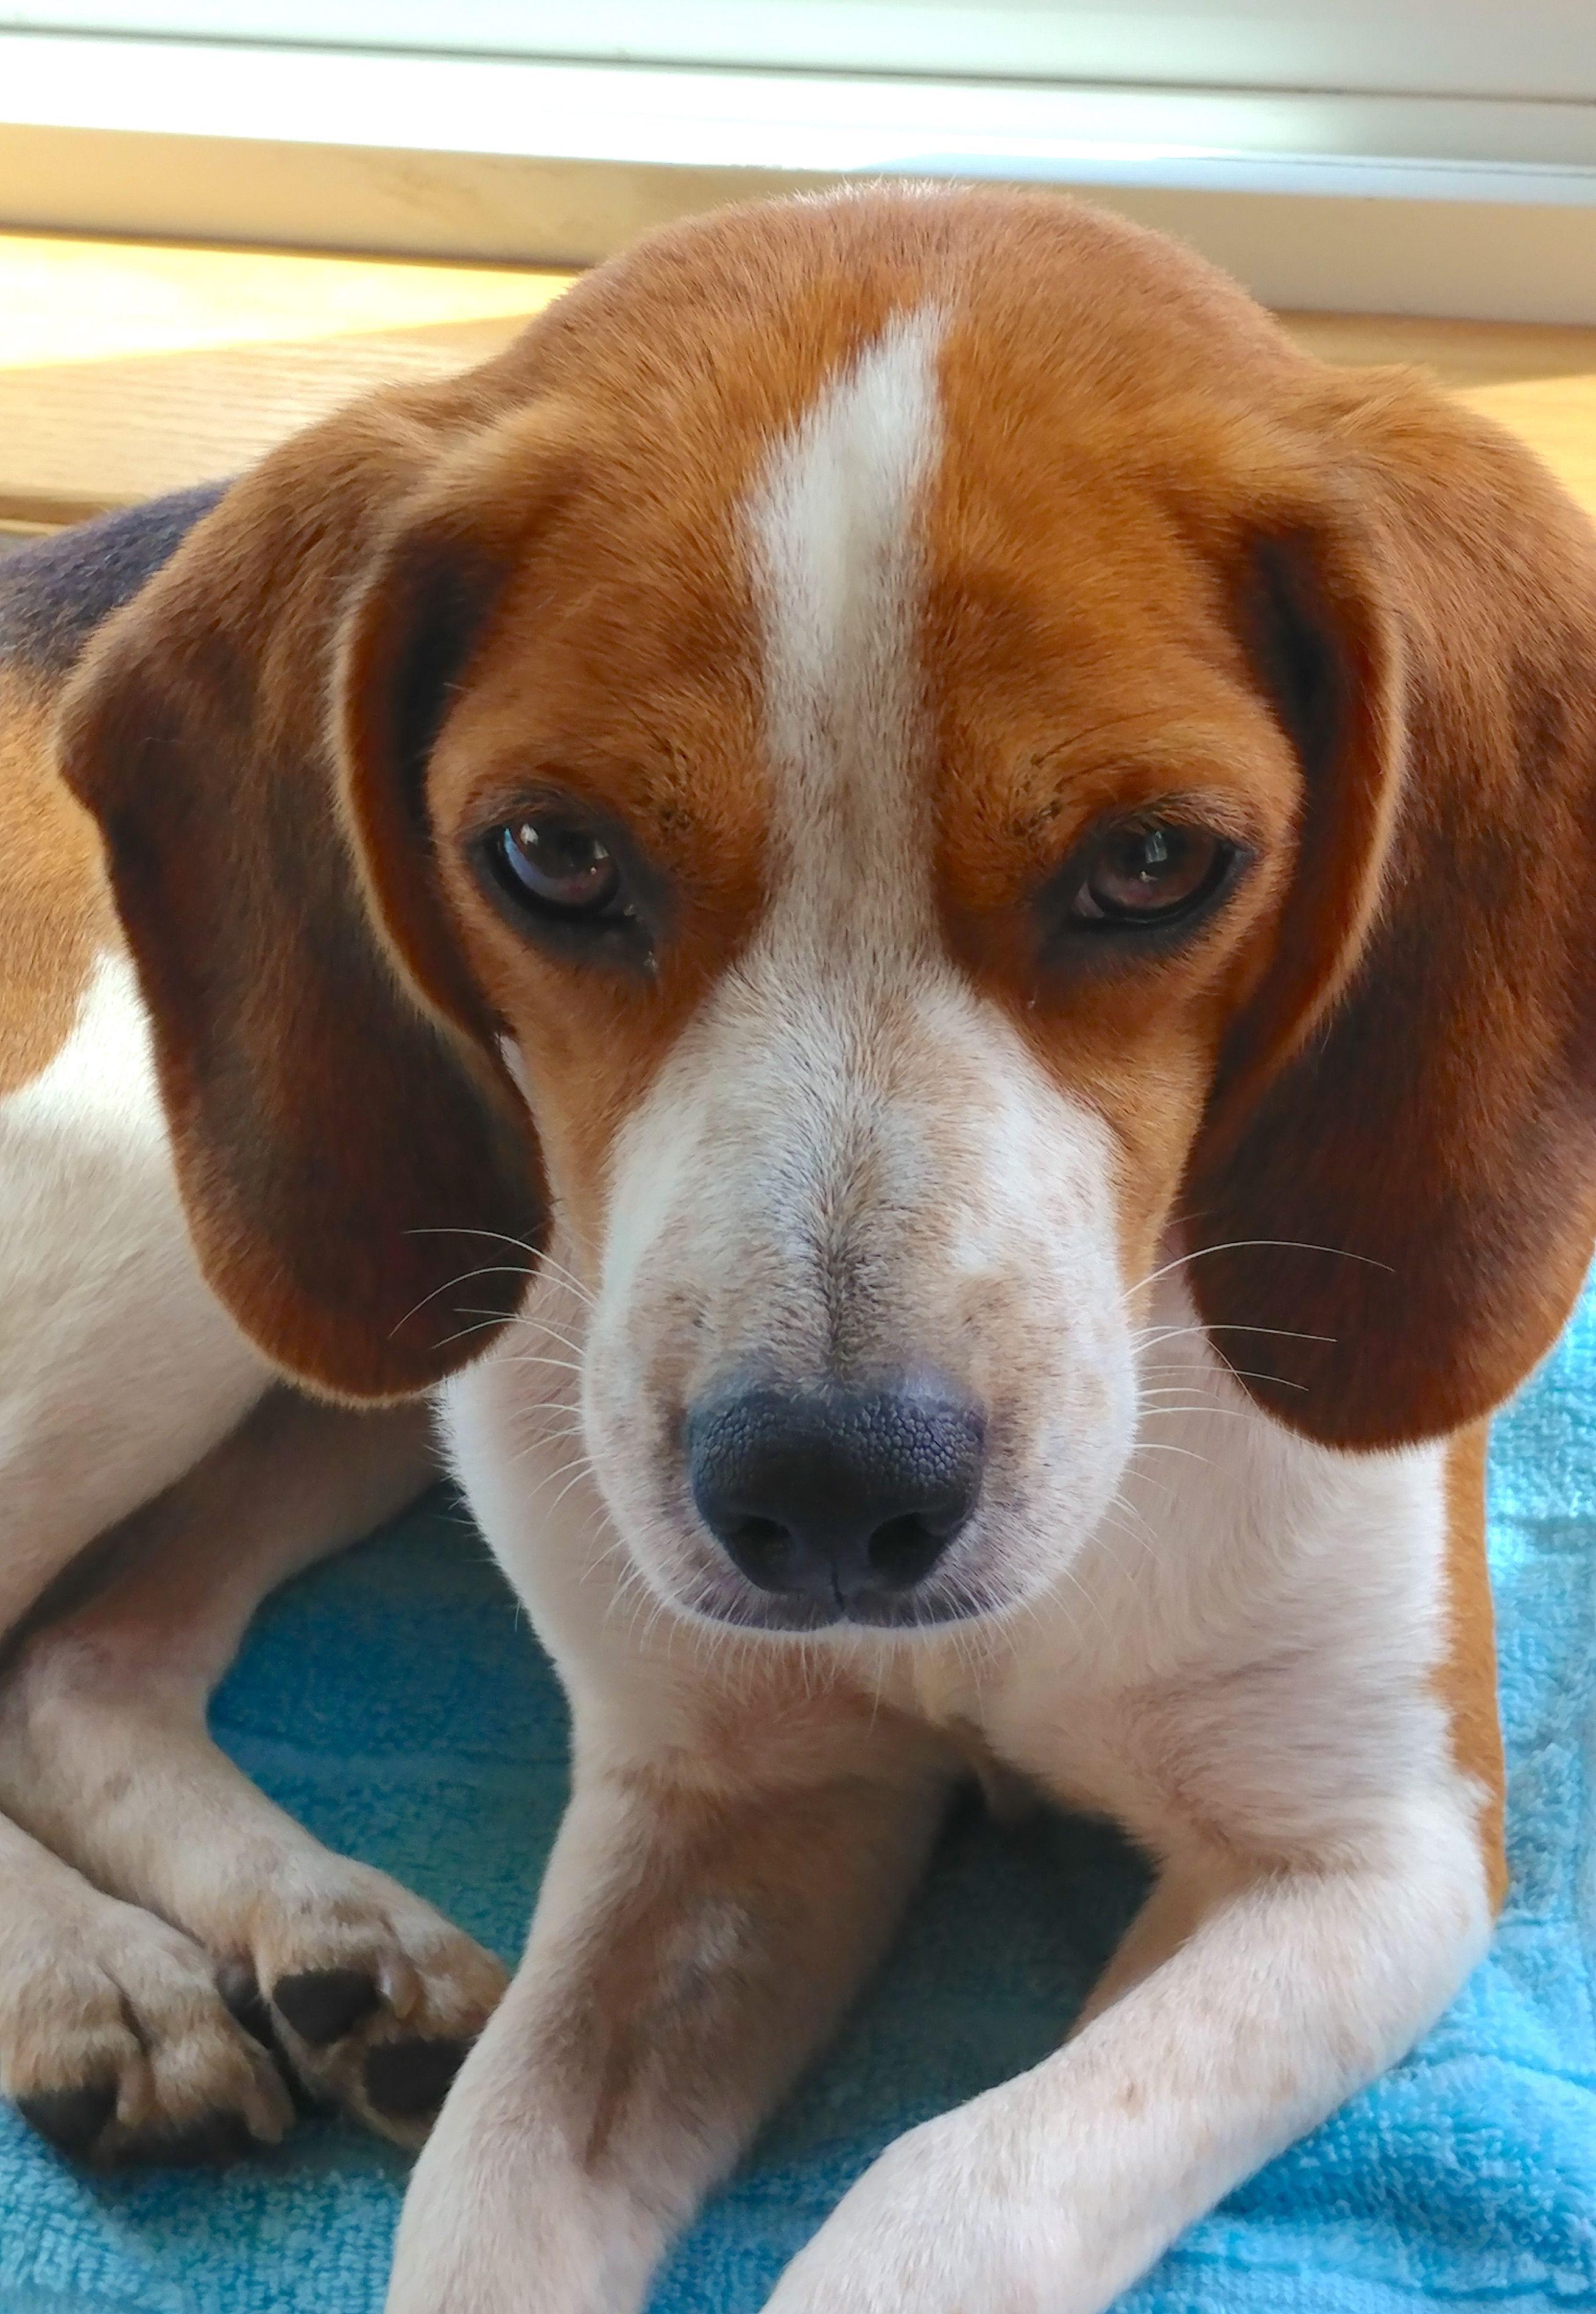 Beagle dog for Adoption in Mankato, MN. ADN635554 on